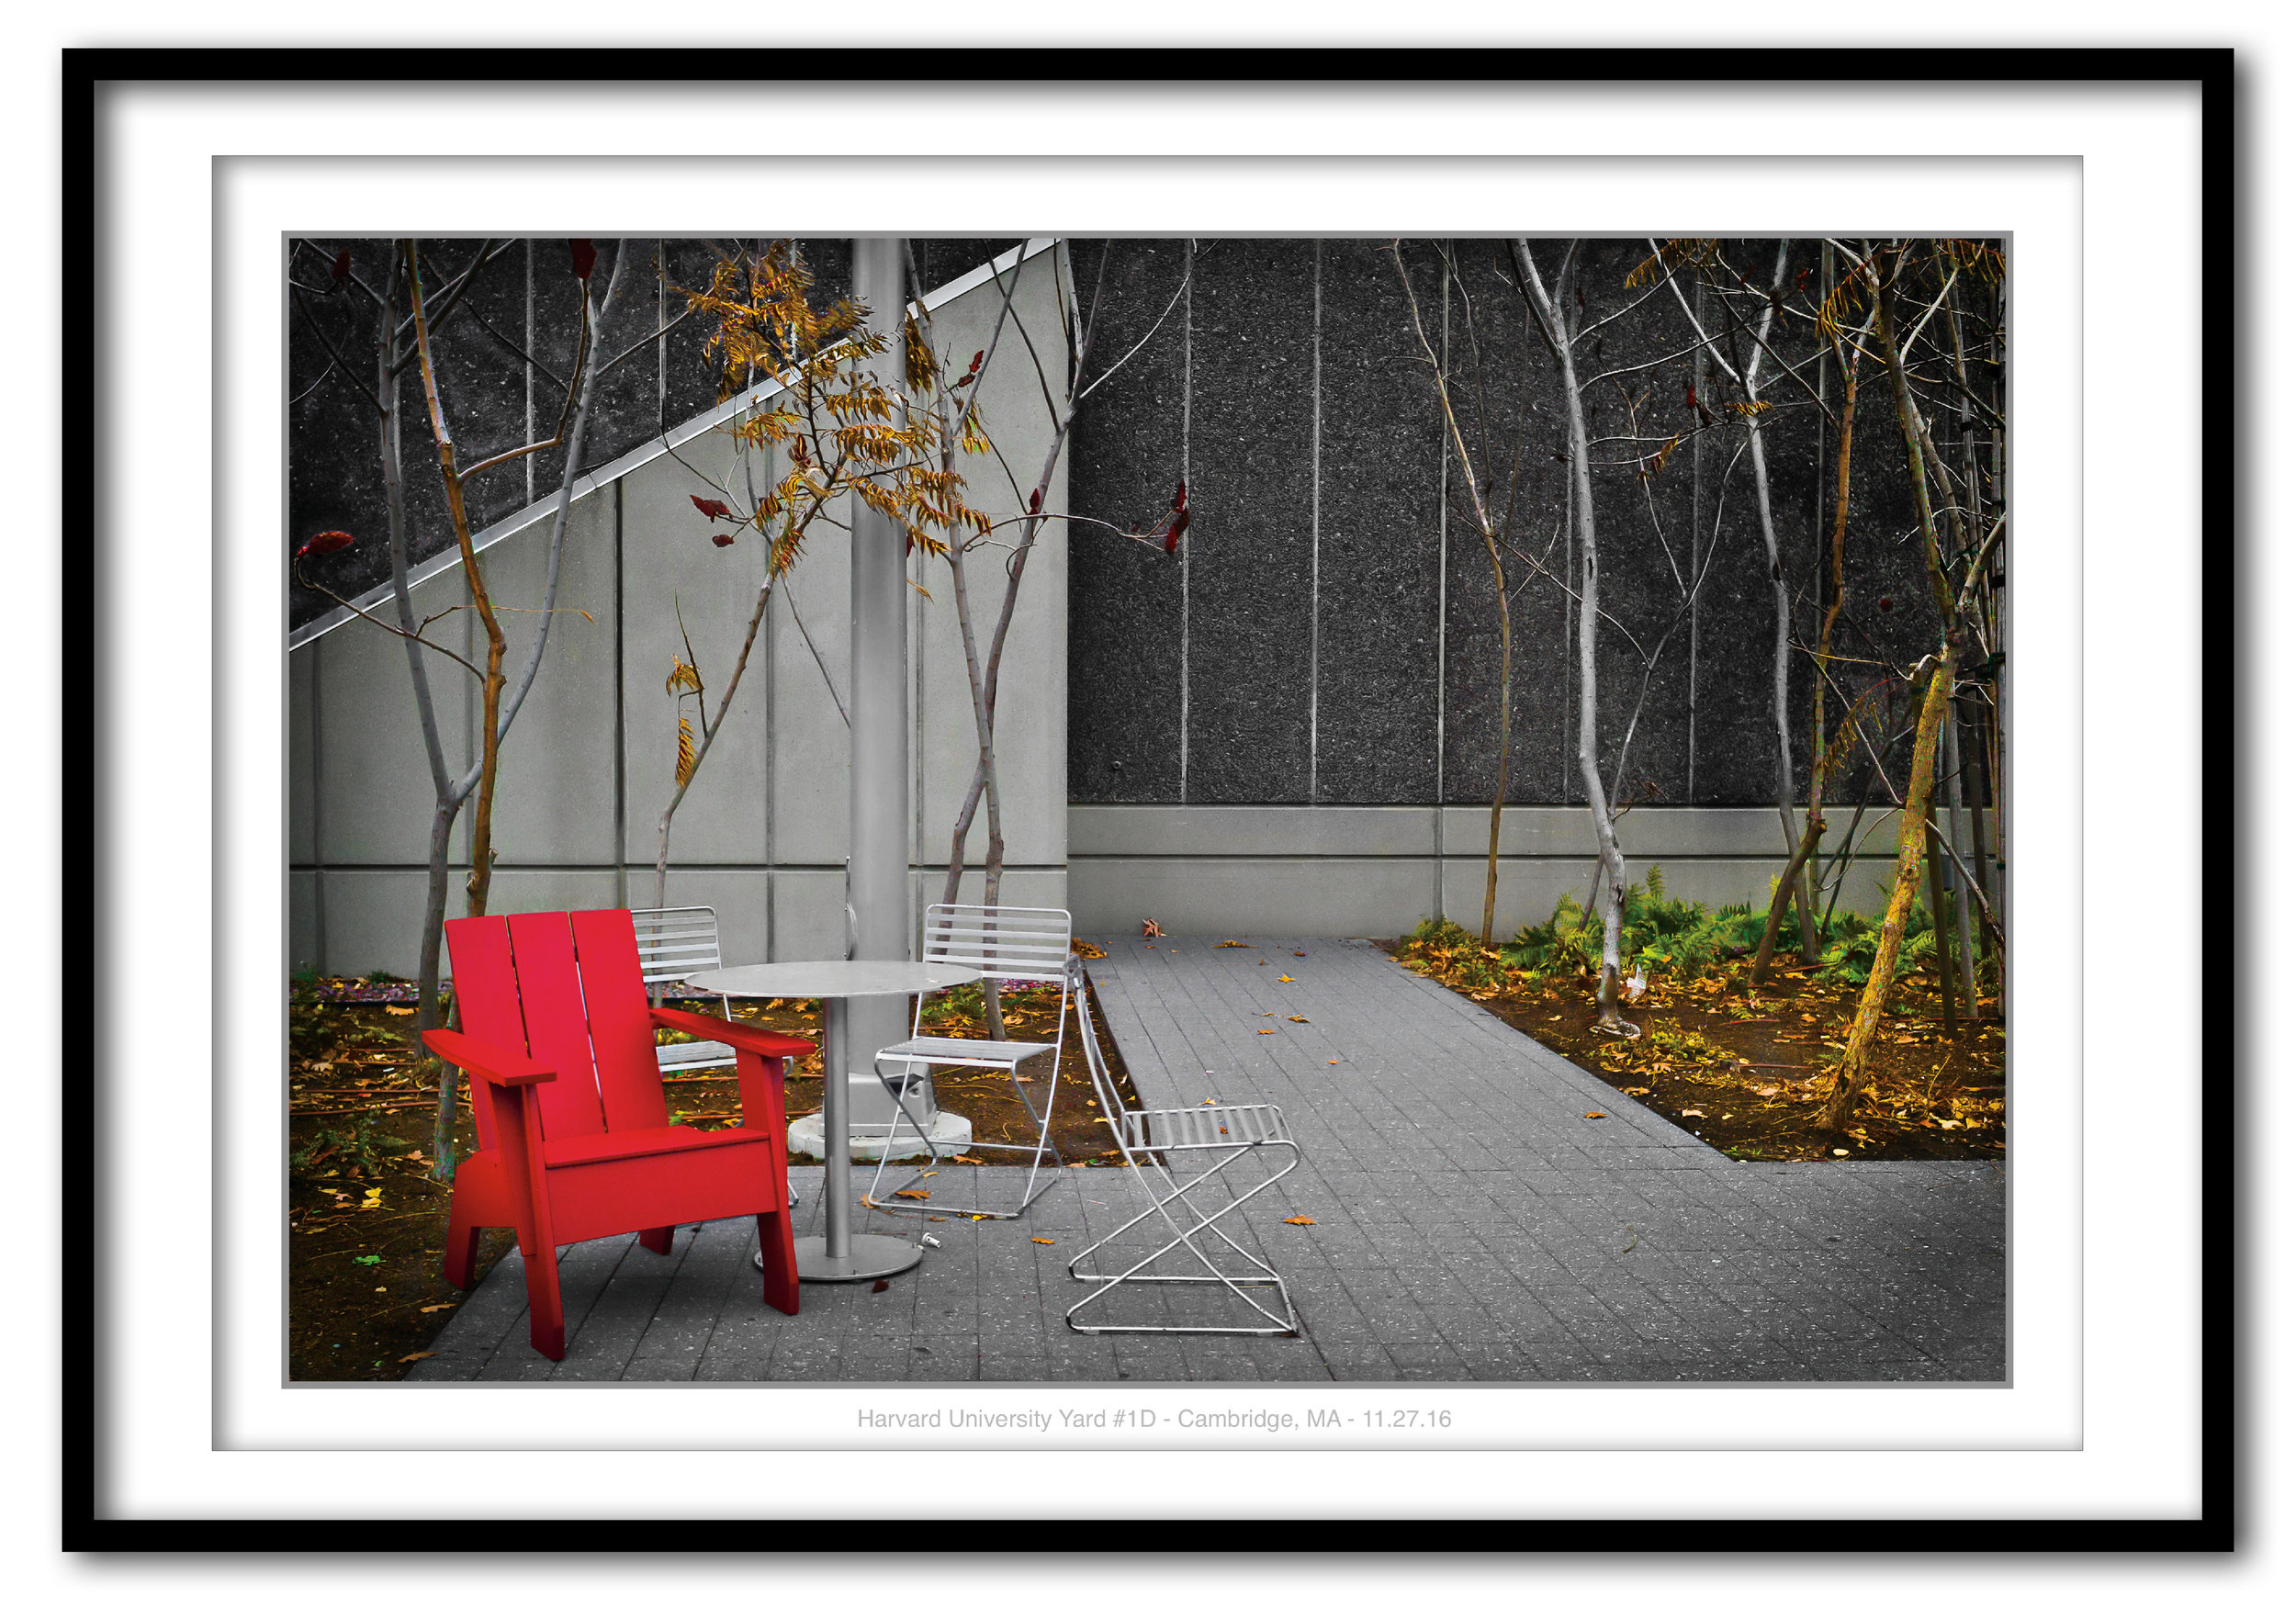 Harvard Yard #1D, Cambridge, MA 11.27.16 - Framed.jpg